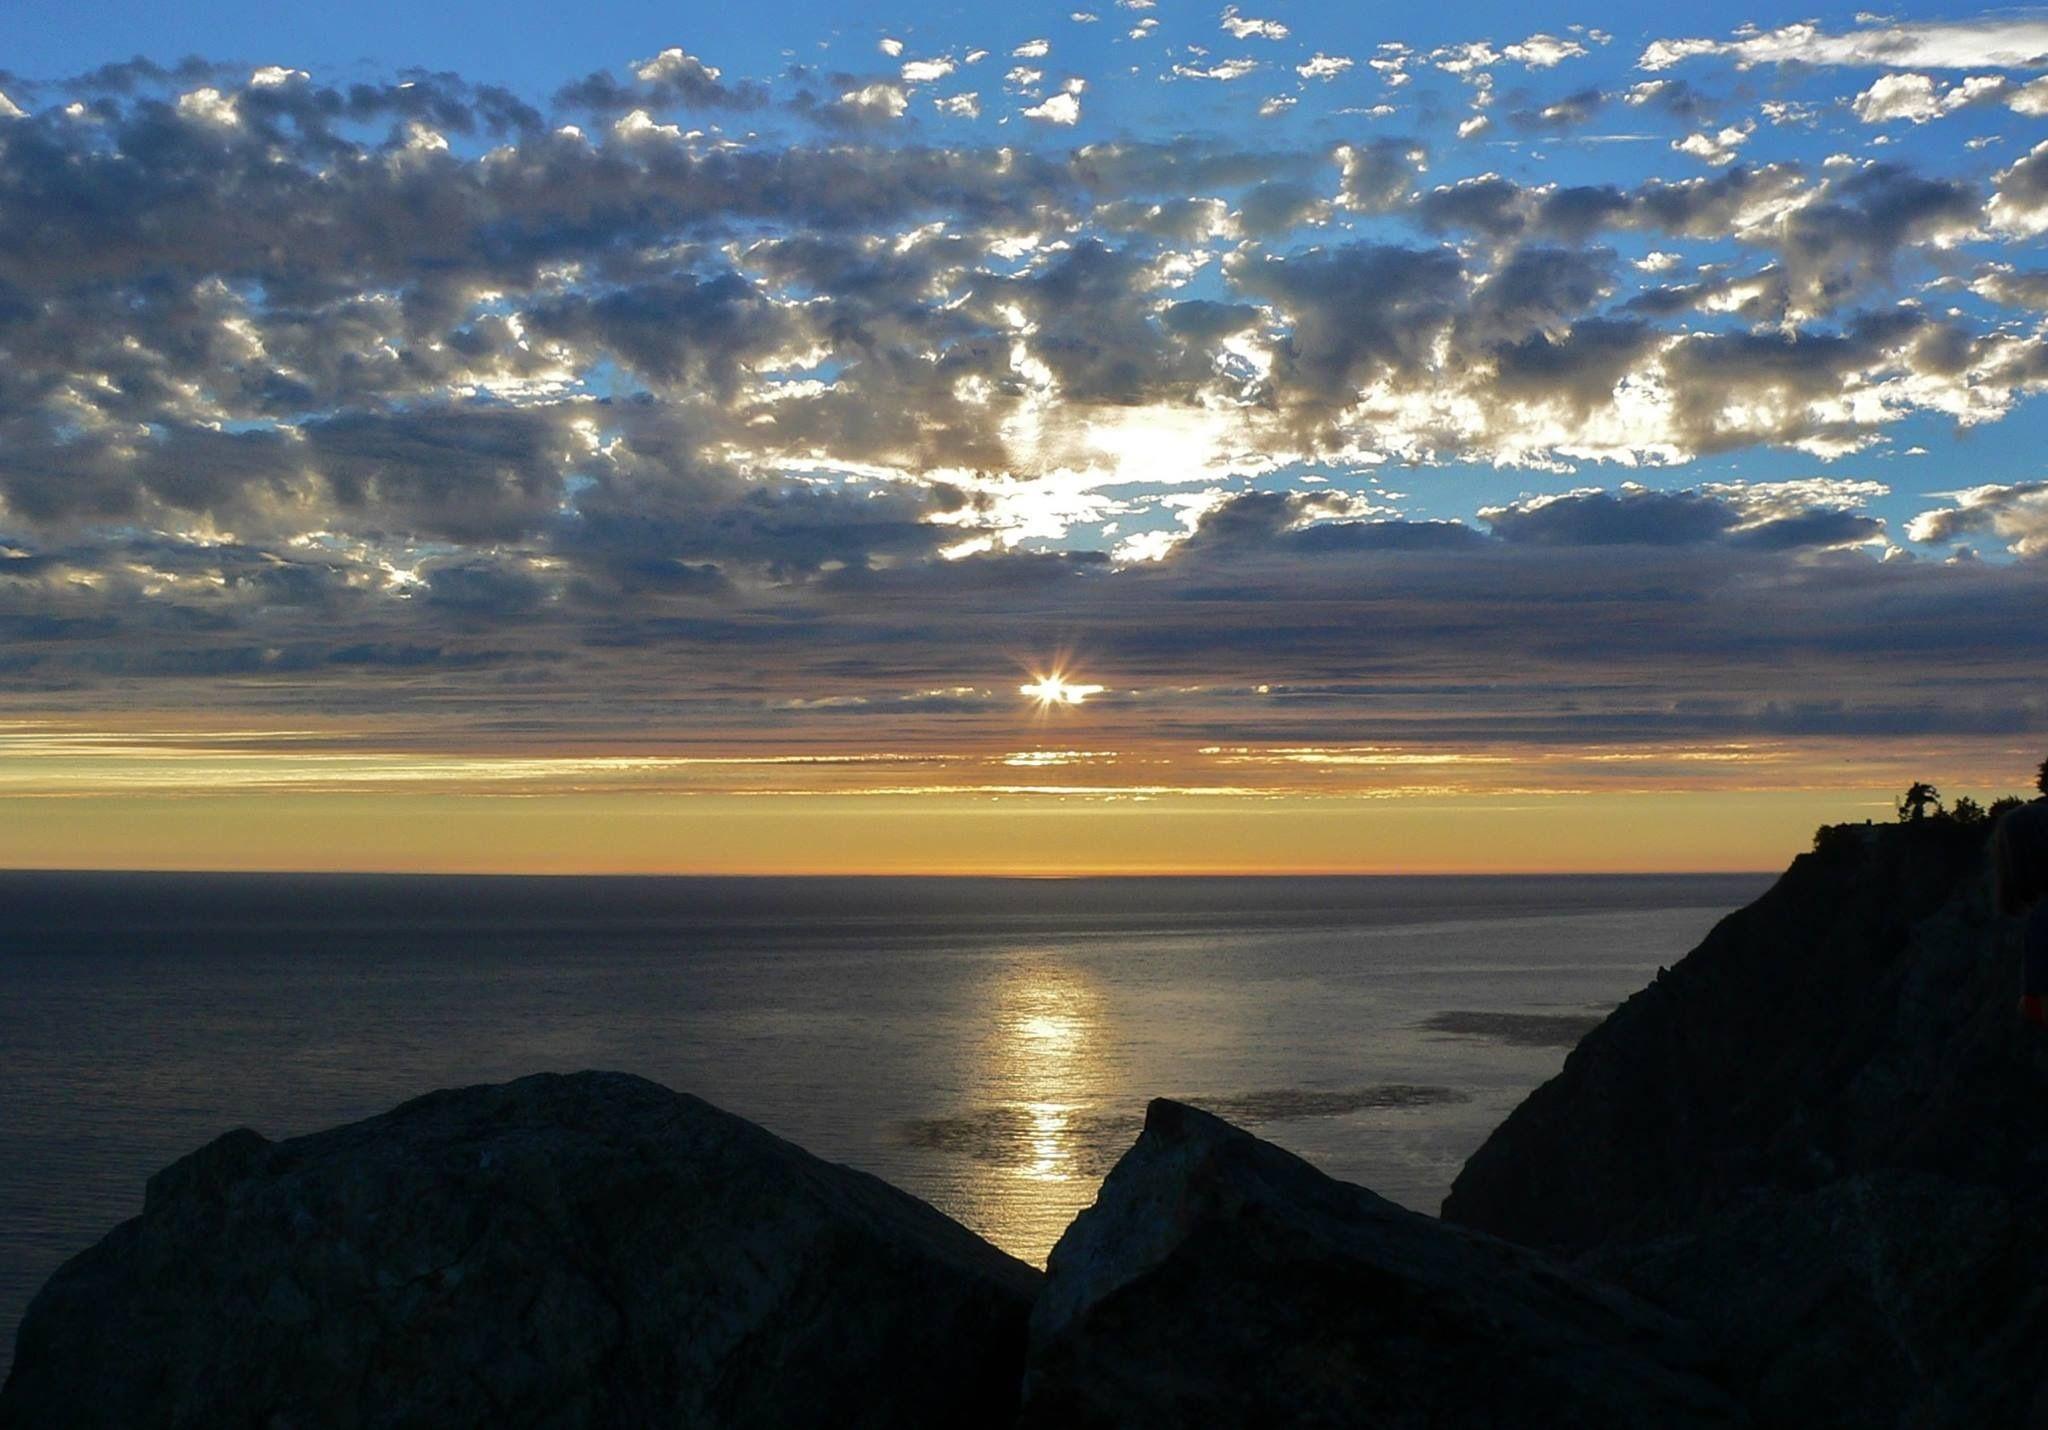 Pacific Ocean near Monterey, California